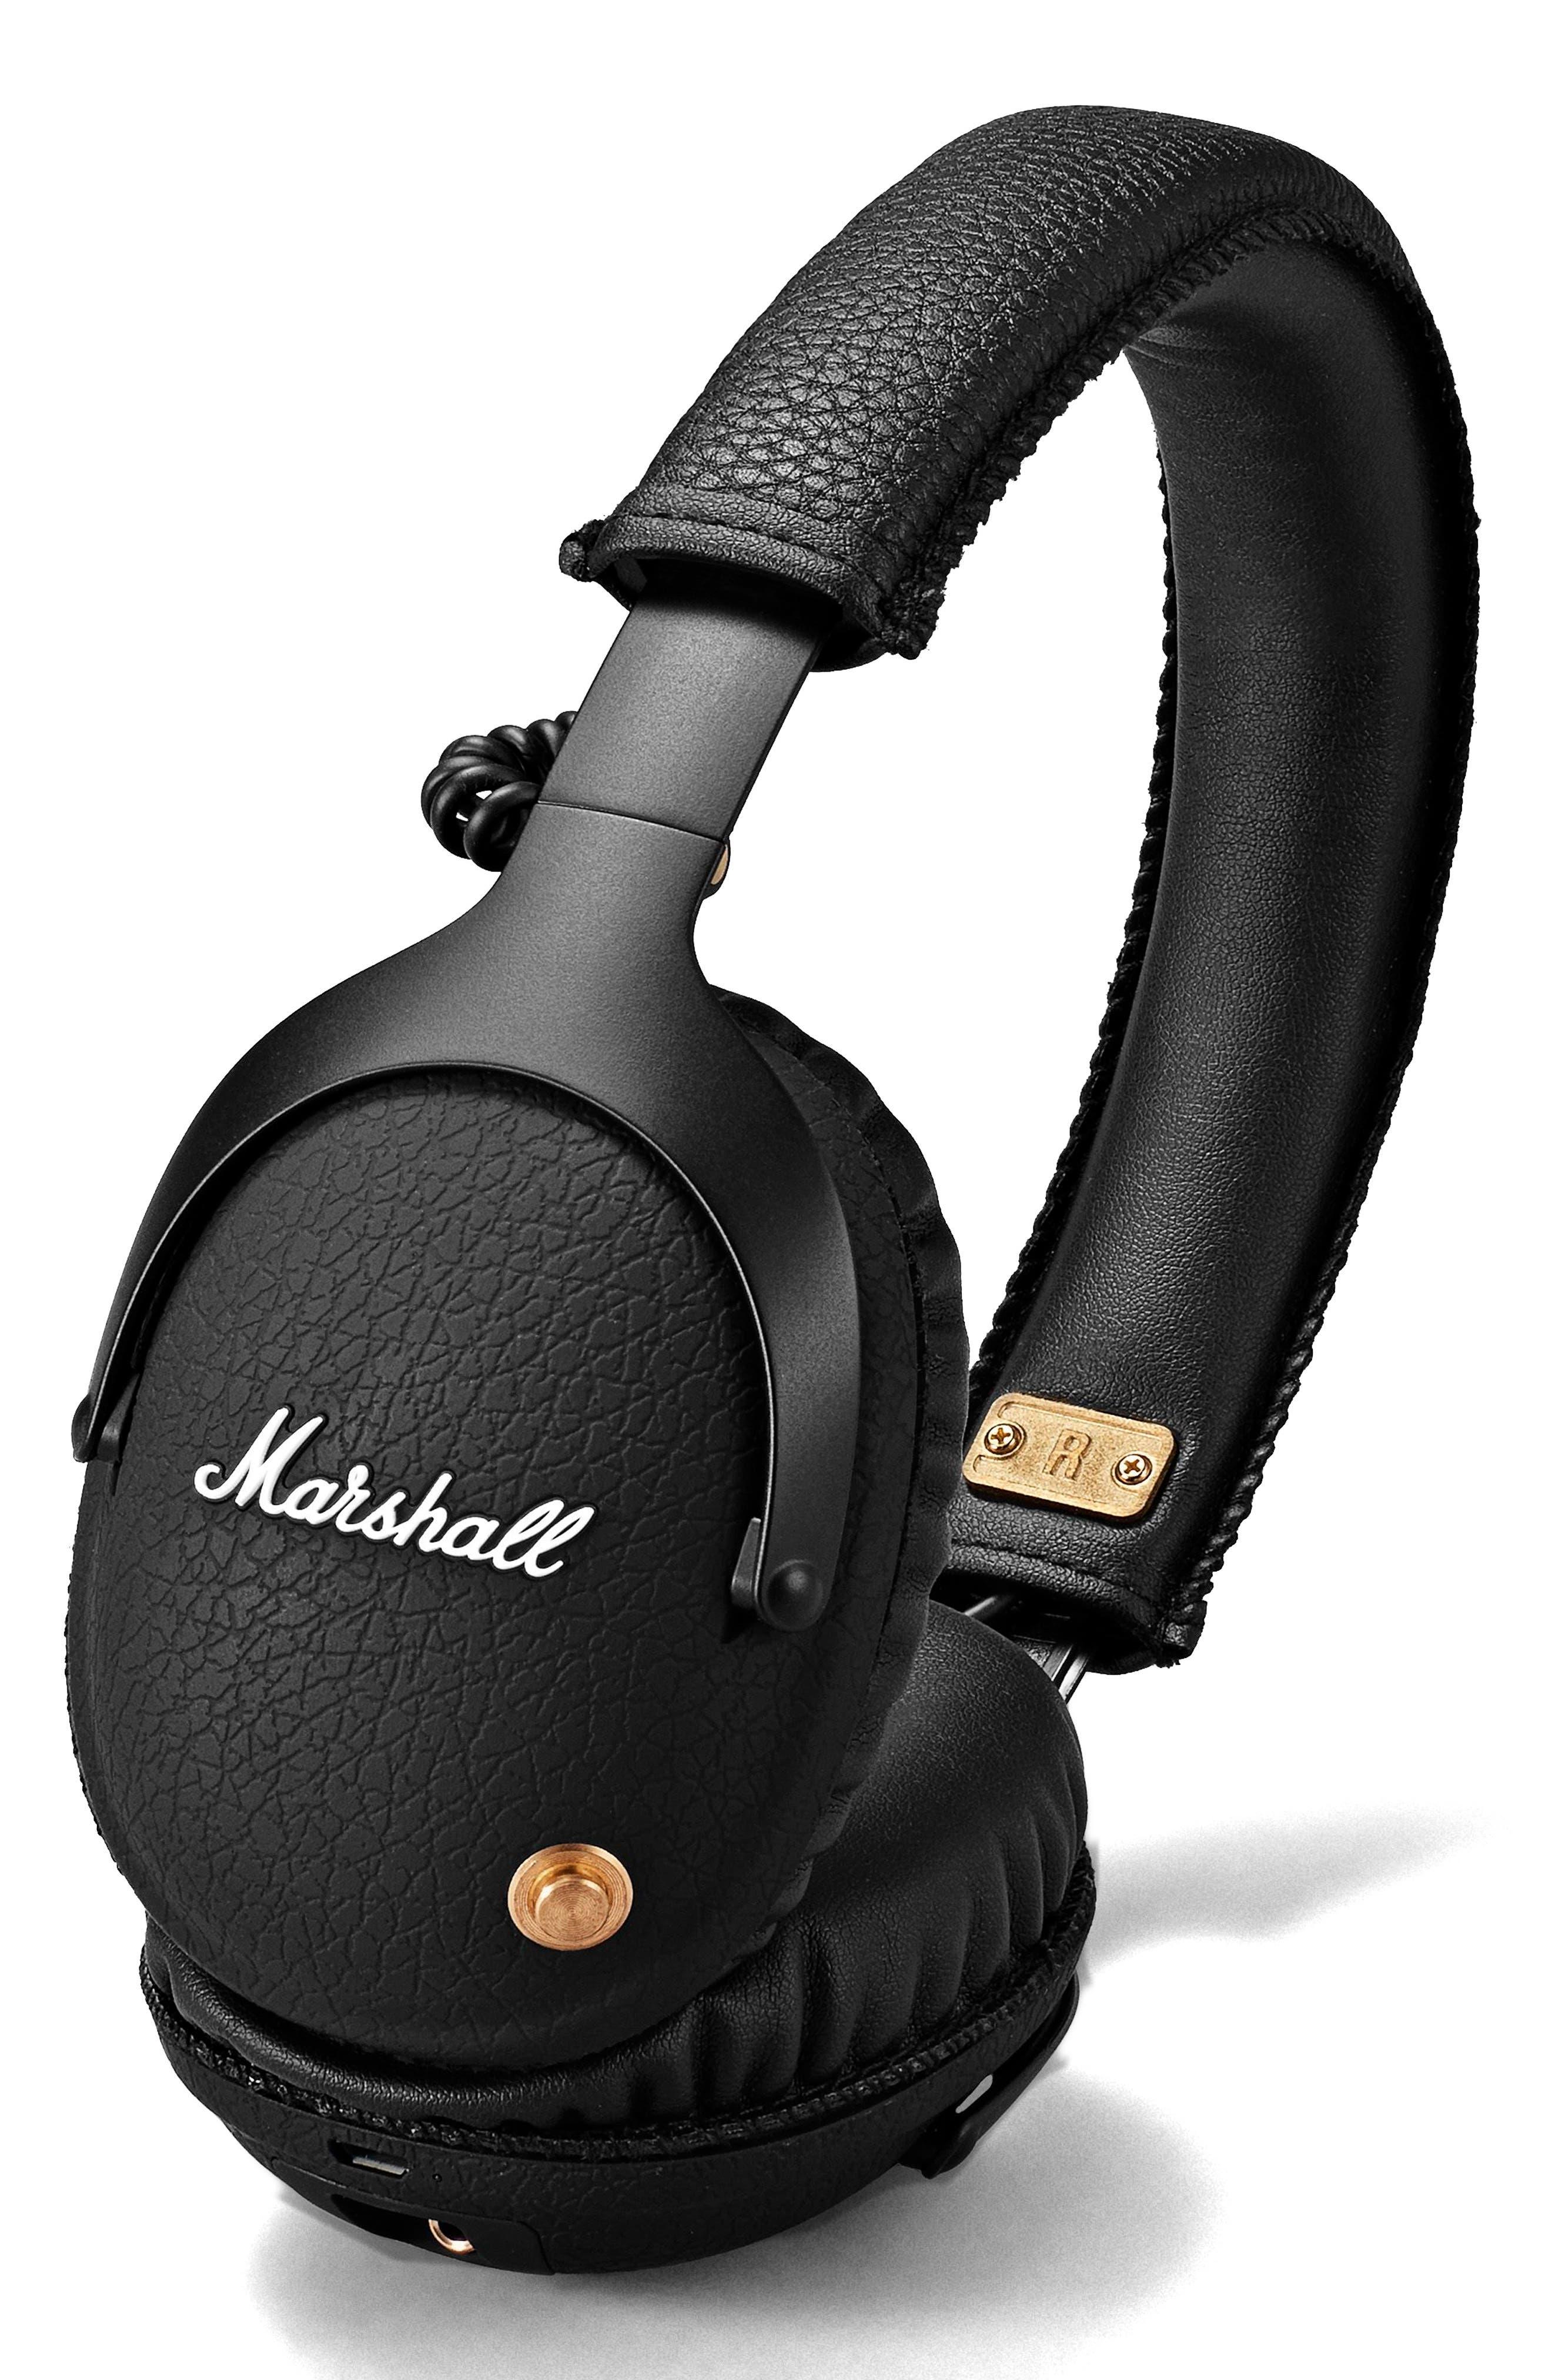 Monitor Bluetooth Wireless Over Ear Headphones,                         Main,                         color, Black